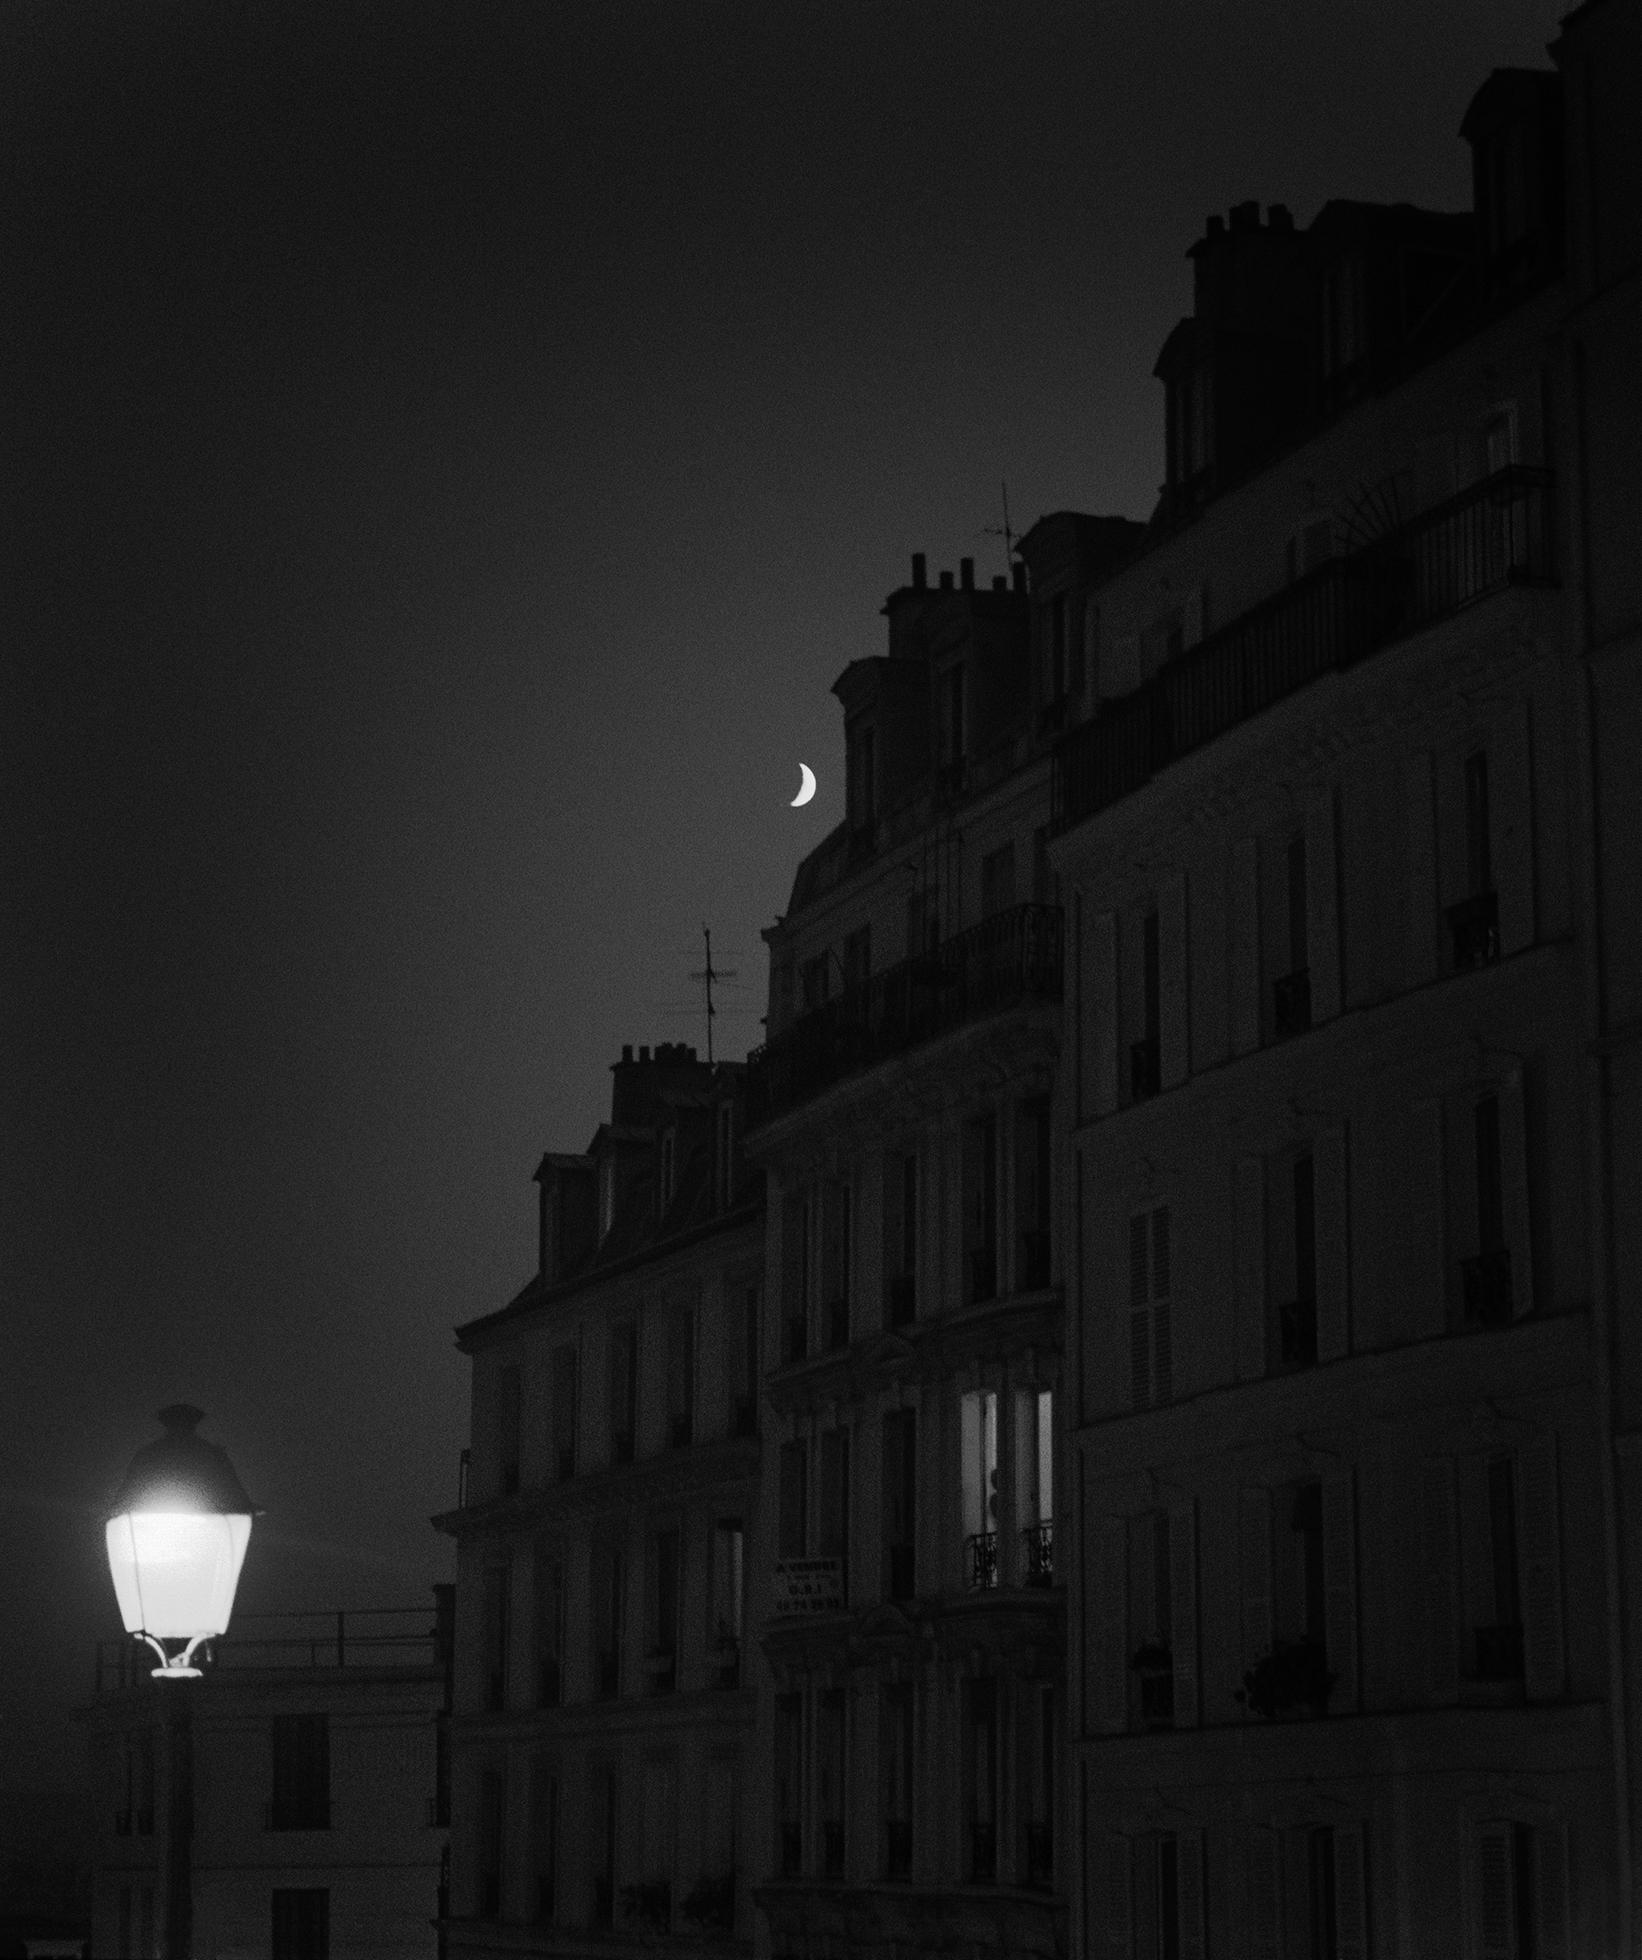 453 - Langer - In The Dark